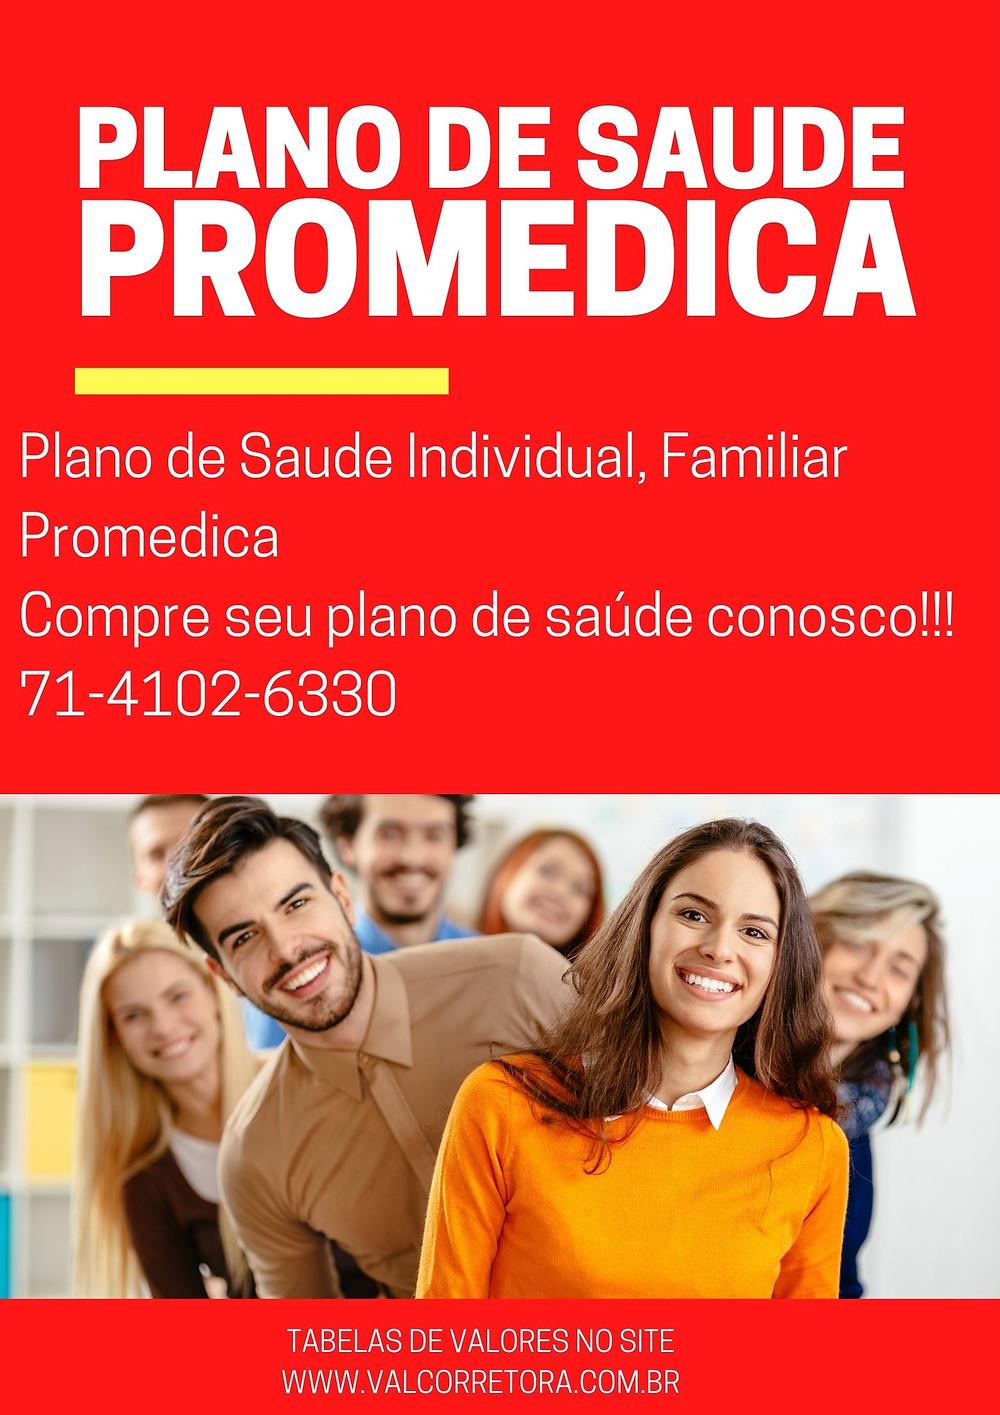 Tabela de Preços Plano de Saude Promedica Individual